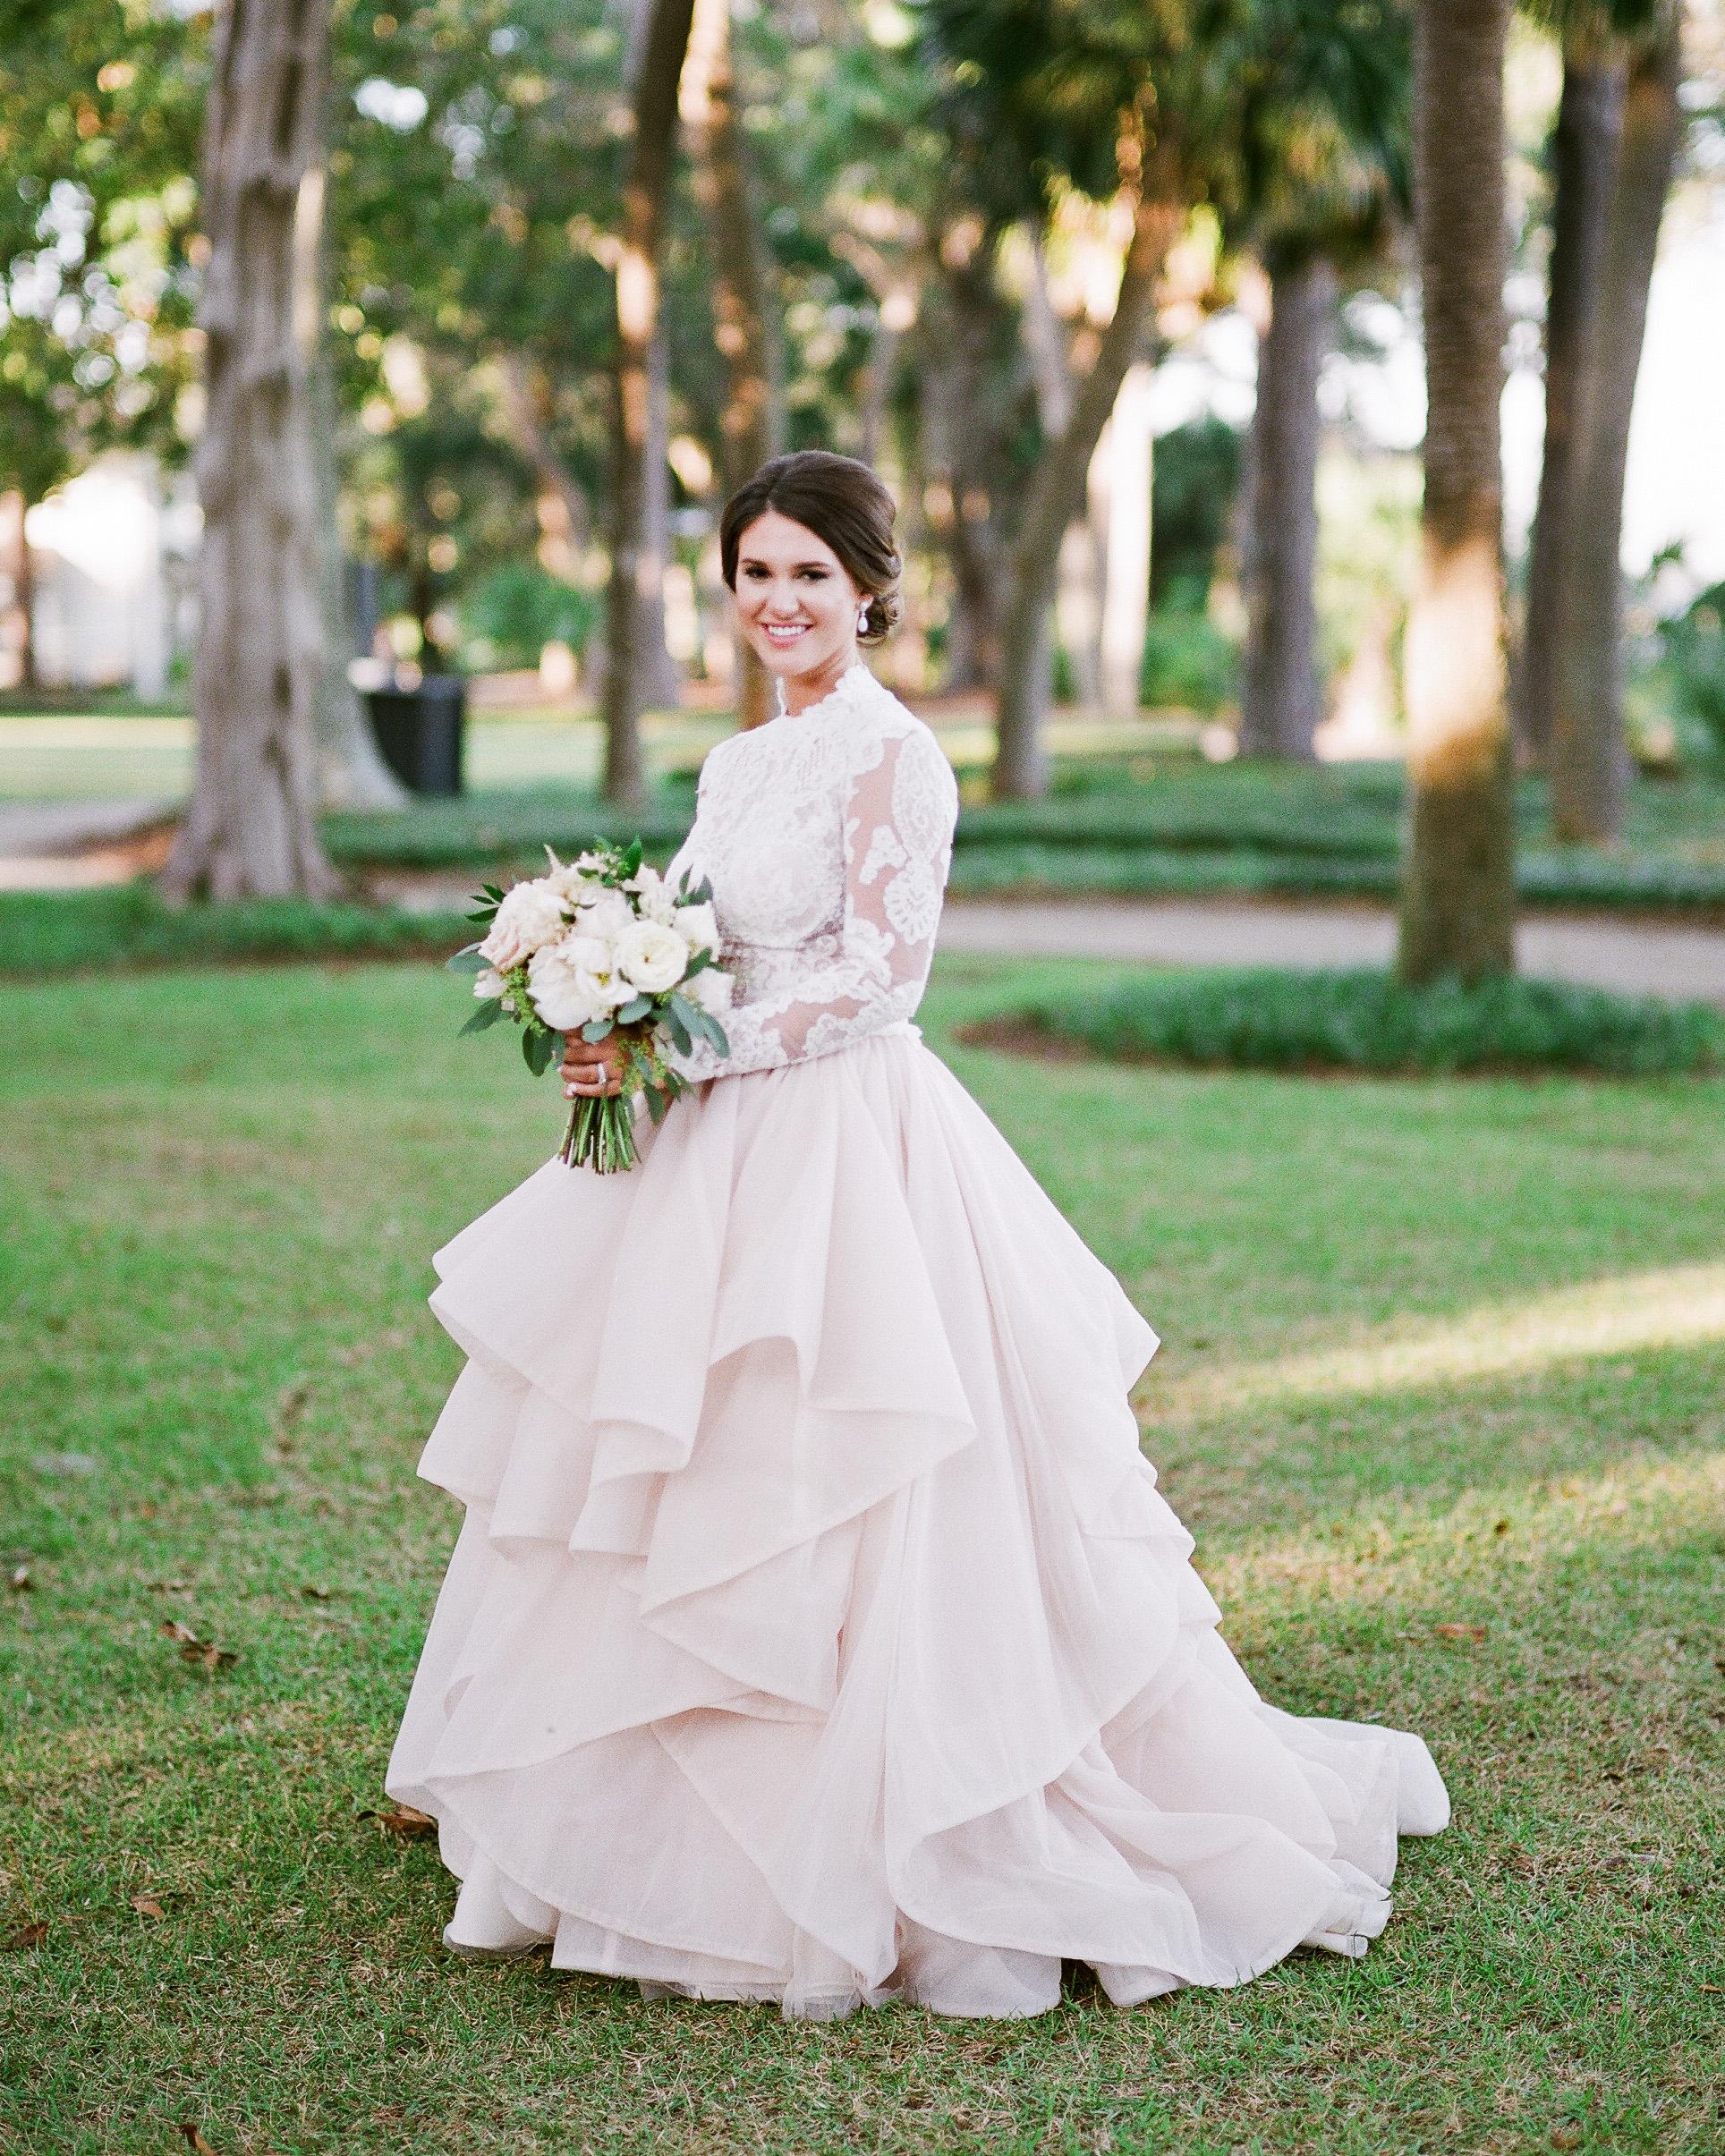 long sleeved wedding blush dress